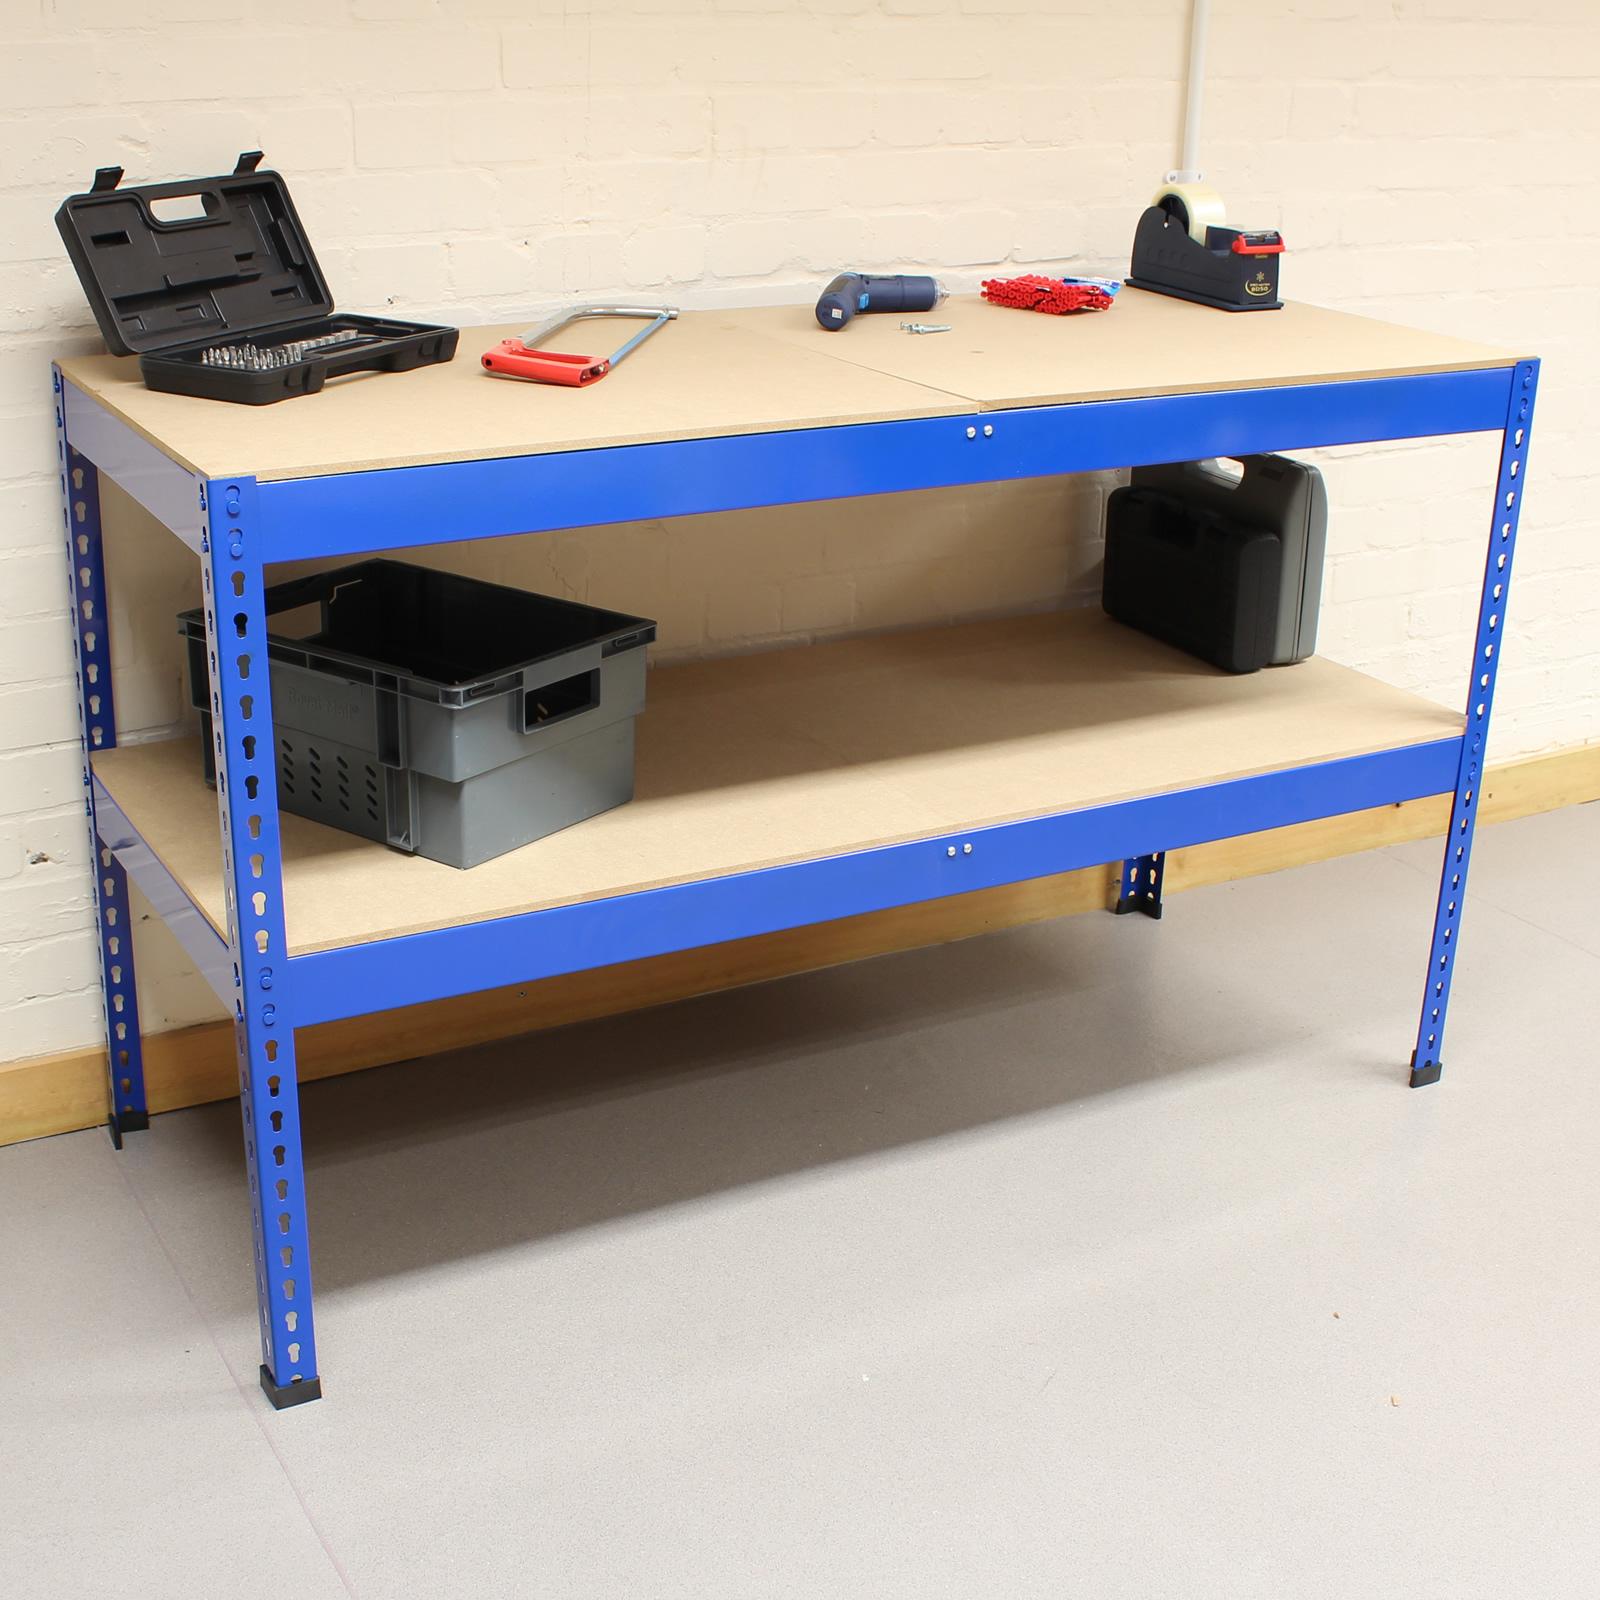 1 5m Blue Heavy Duty Steel Work Bench Station Shelves For Garage Warehouse Shed Ebay